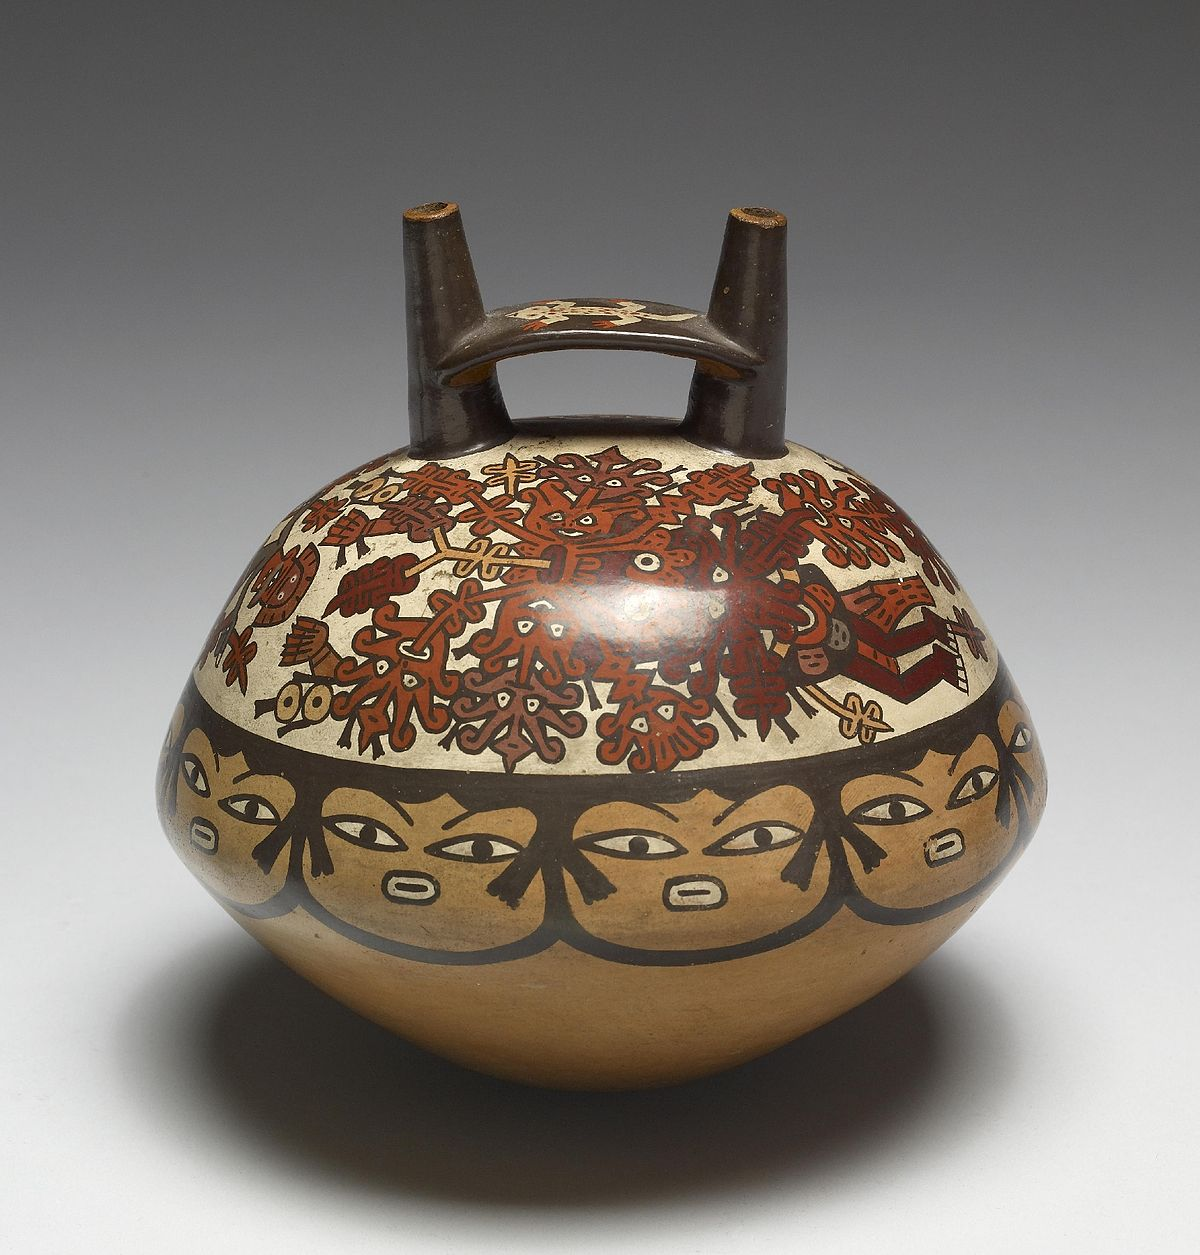 Cer mica nazca wikipedia la enciclopedia libre for Origen de la ceramica